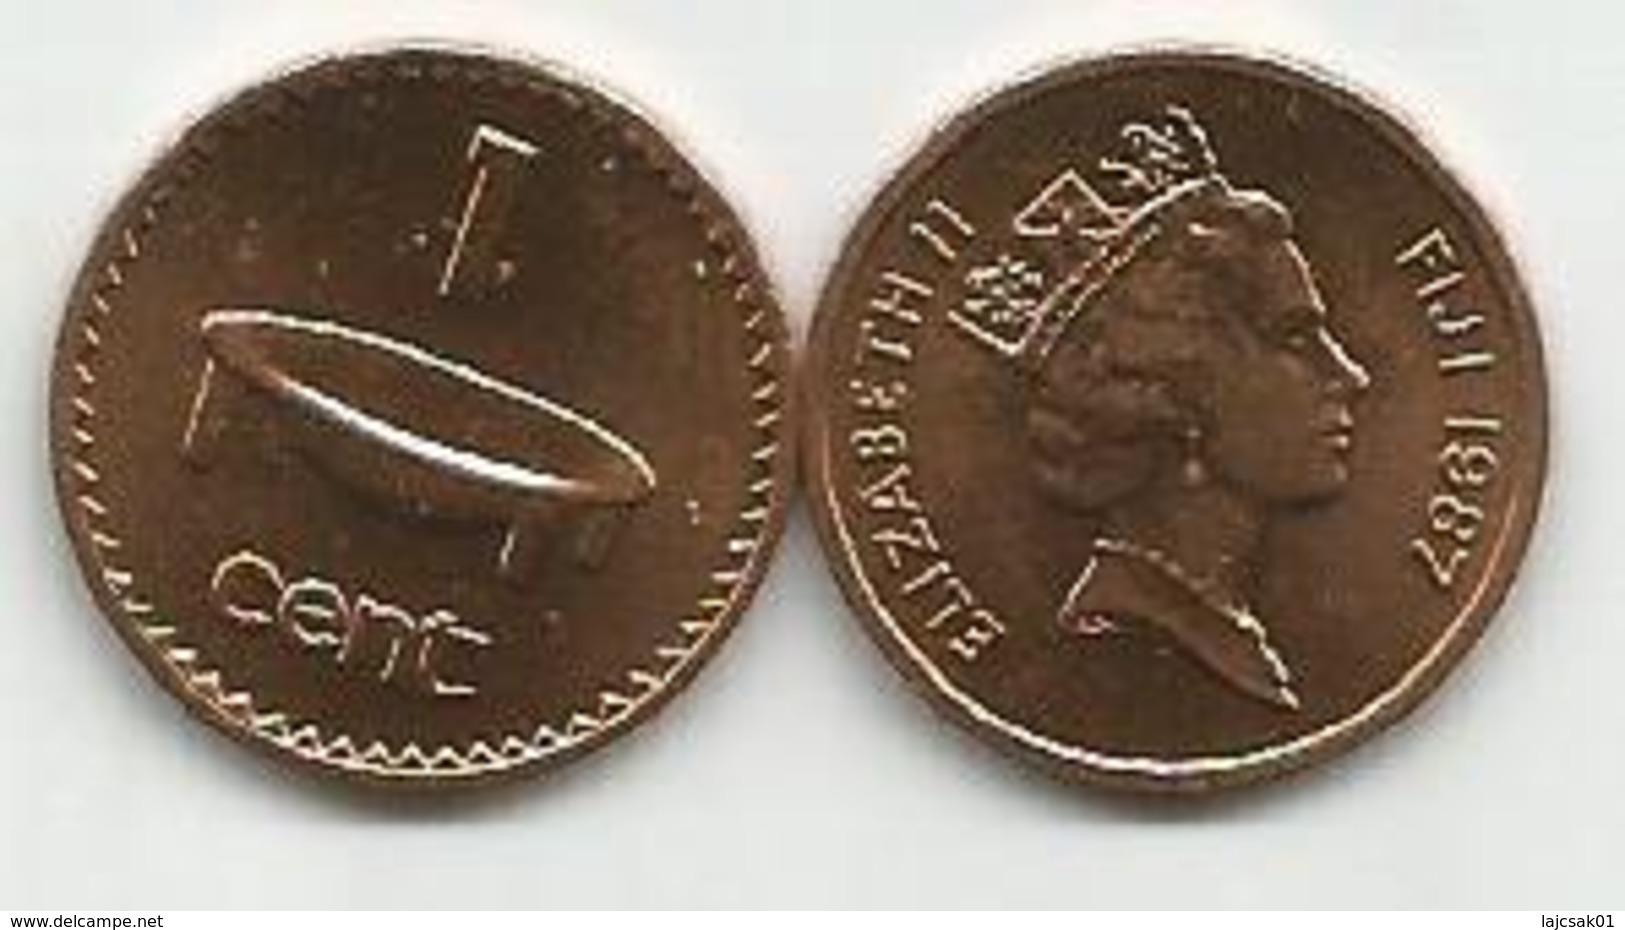 Fiji  1 Cent 1987. High Grade - Fiji